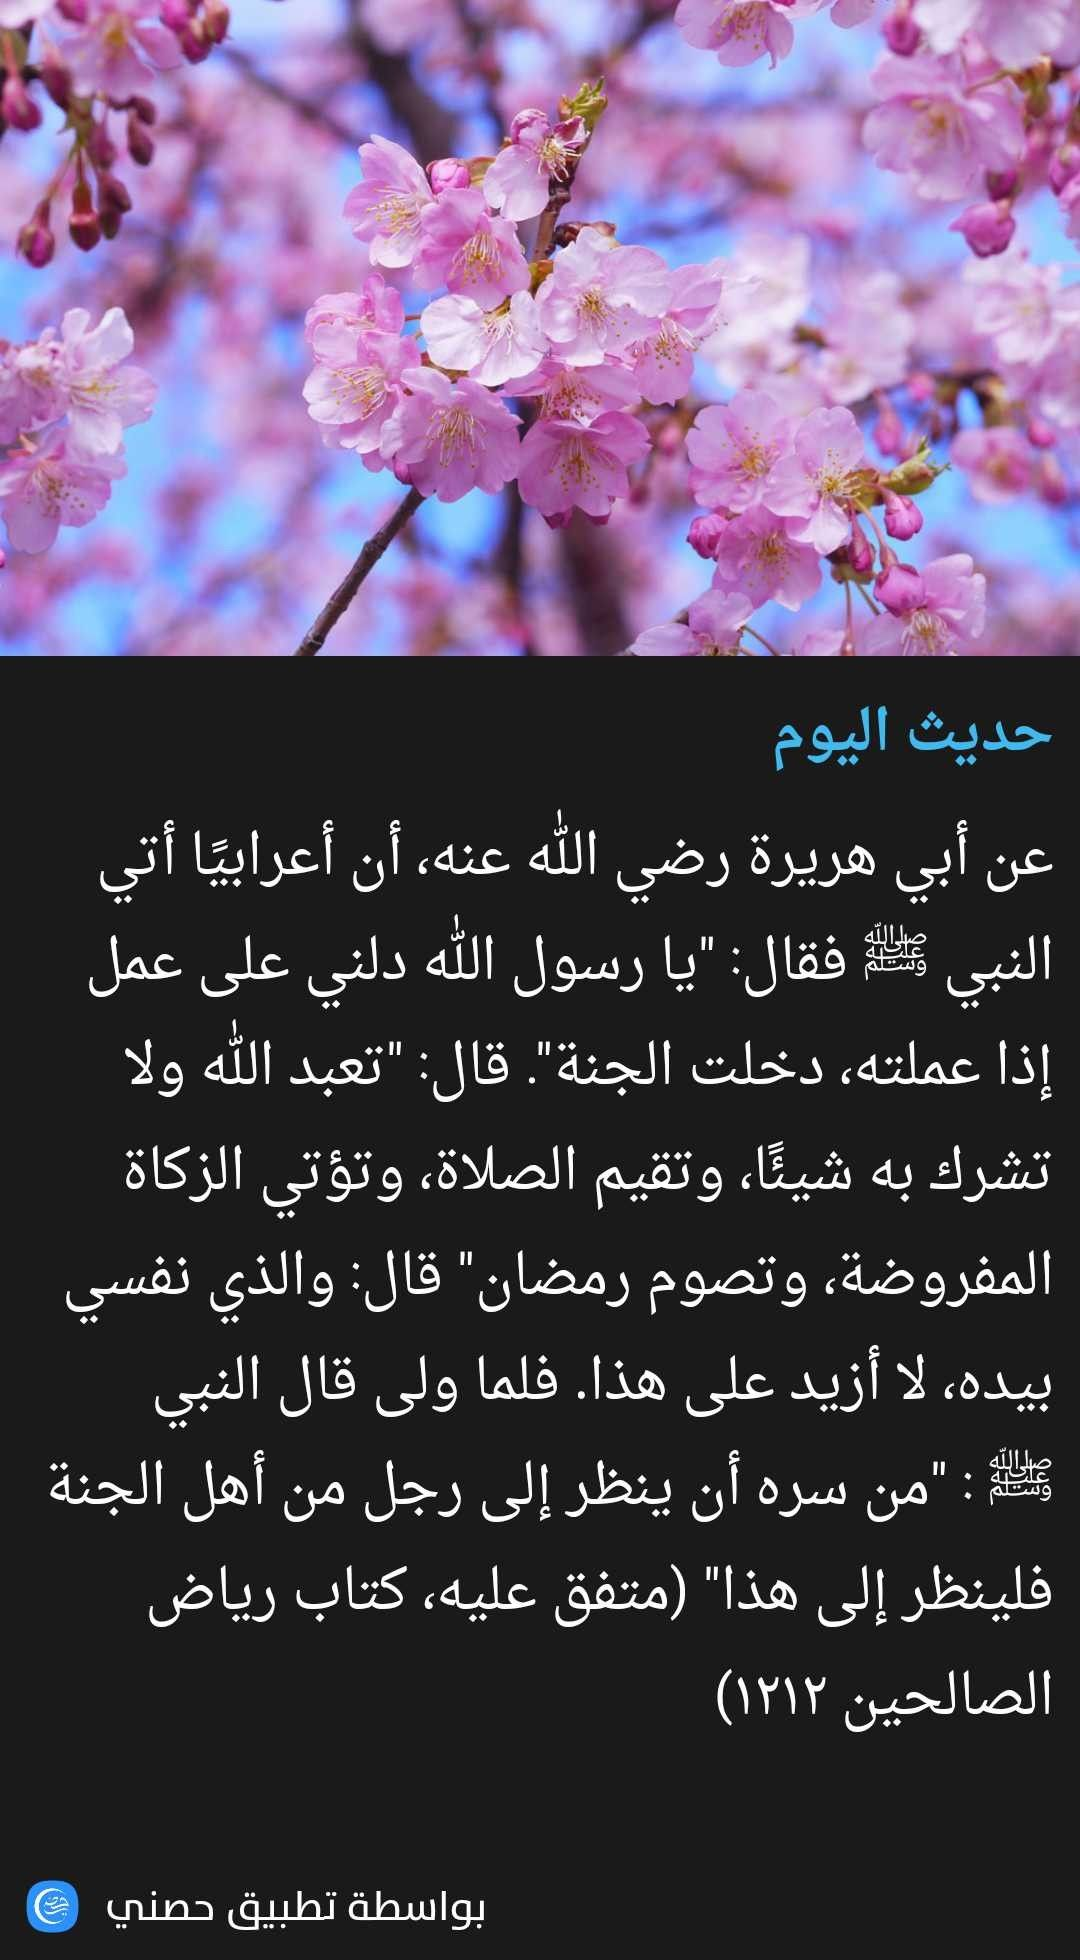 Pin By Firas Ben On أحاديث نبوية ٢ Hadith My Love Islam